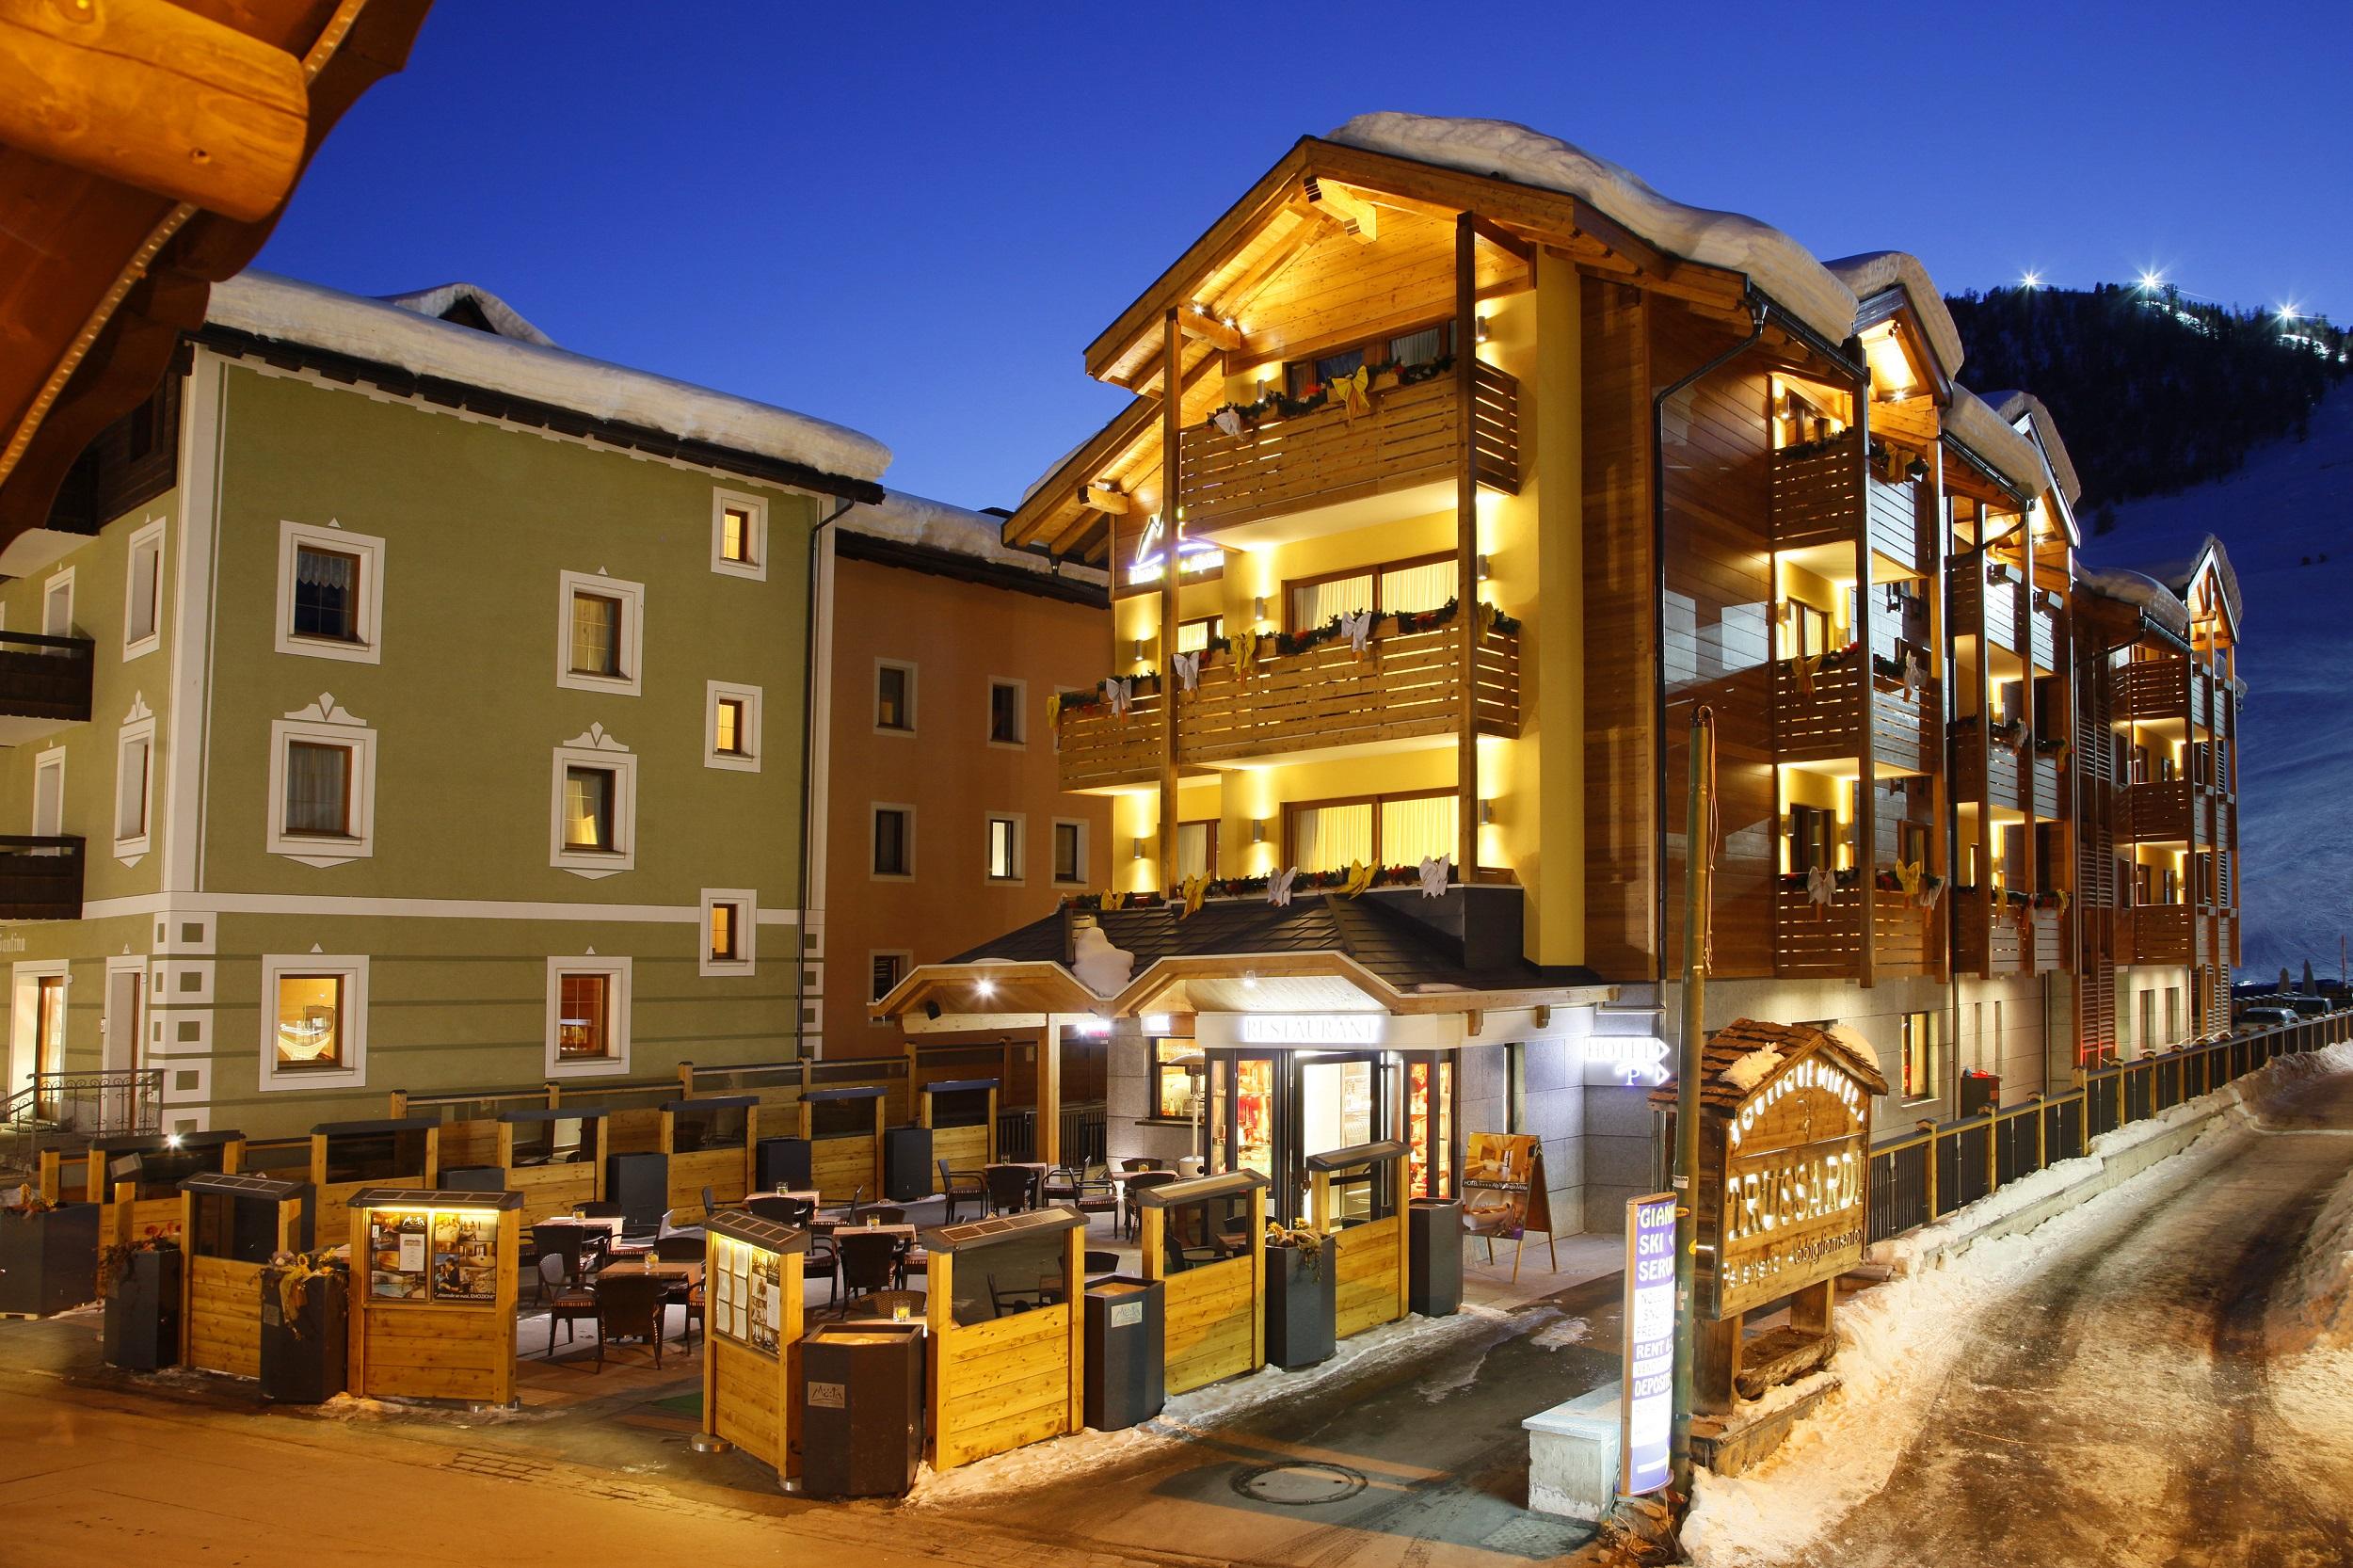 Hotel con piscina hotel alp wellness mota livigno - Livigno hotel con piscina ...